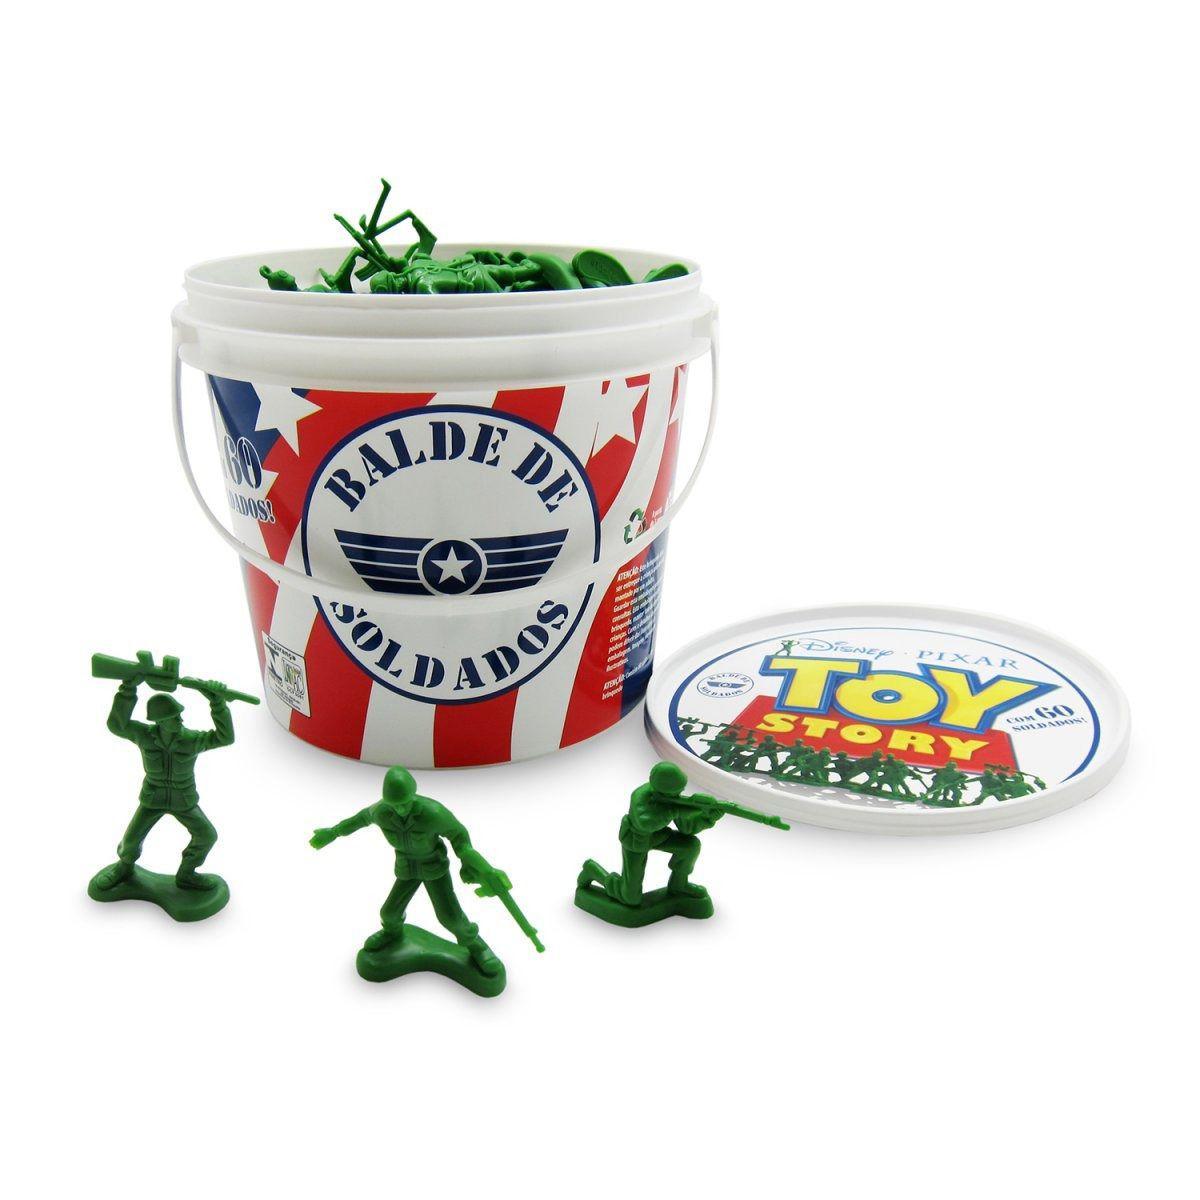 Balde Soldados Toy Story Plastico Toyng